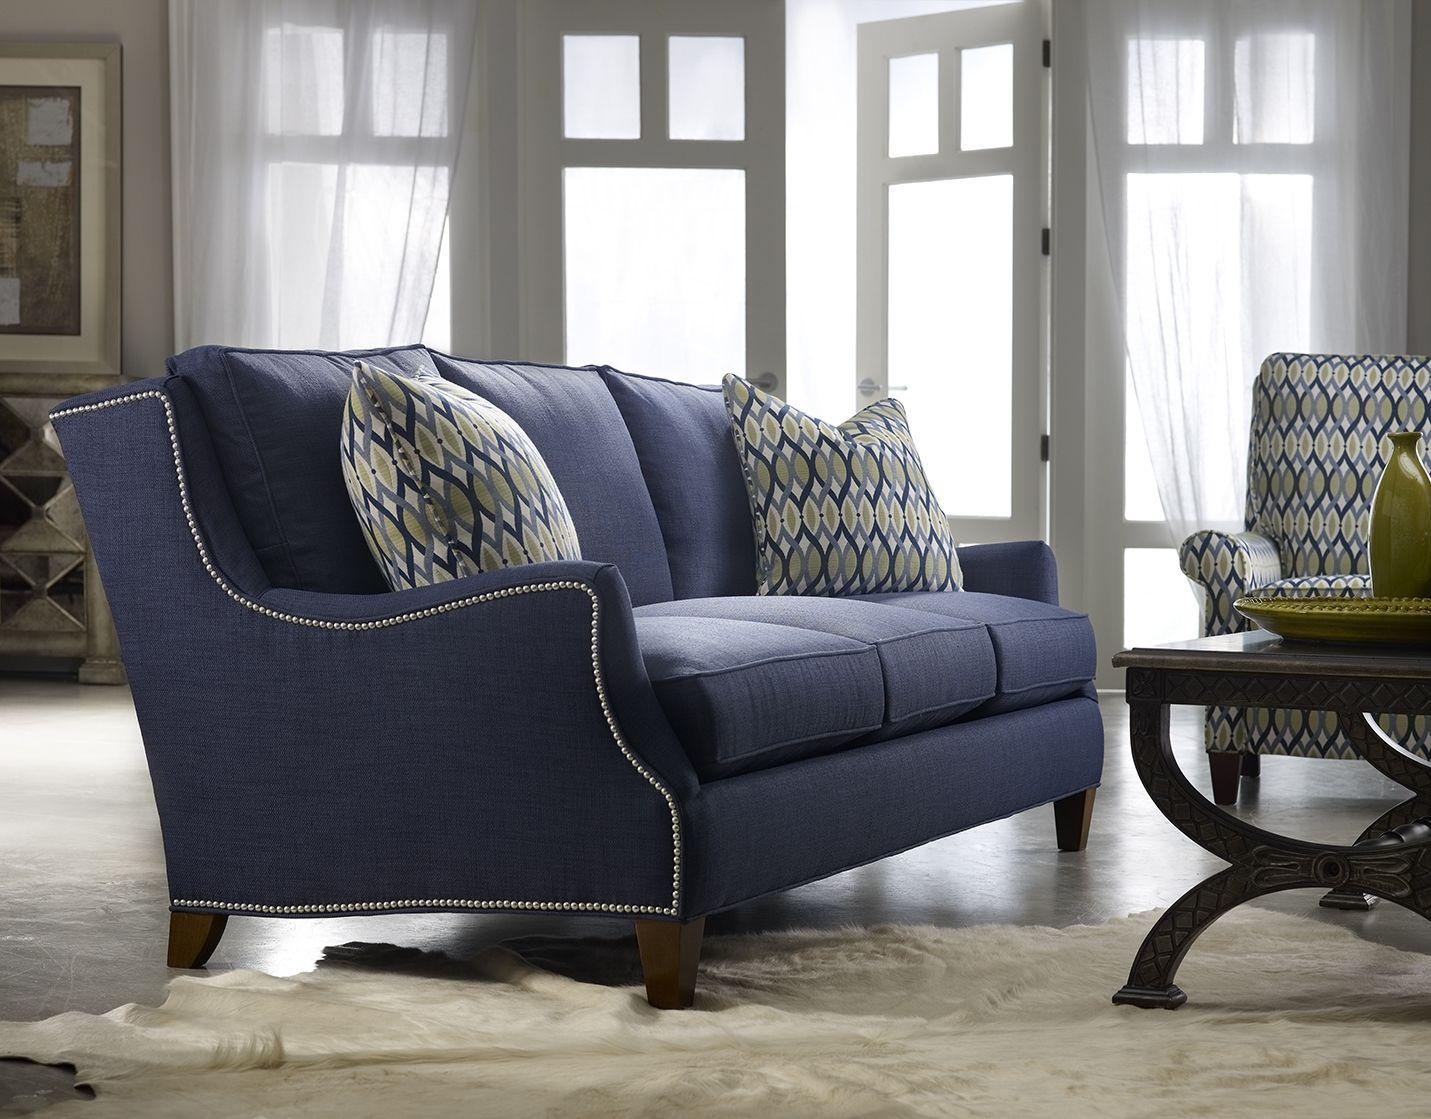 Sam Moore Tansy Sofa Nail Head Trim Navy Blue Living Room Sets Furniture Blue Living Room Sets Furniture